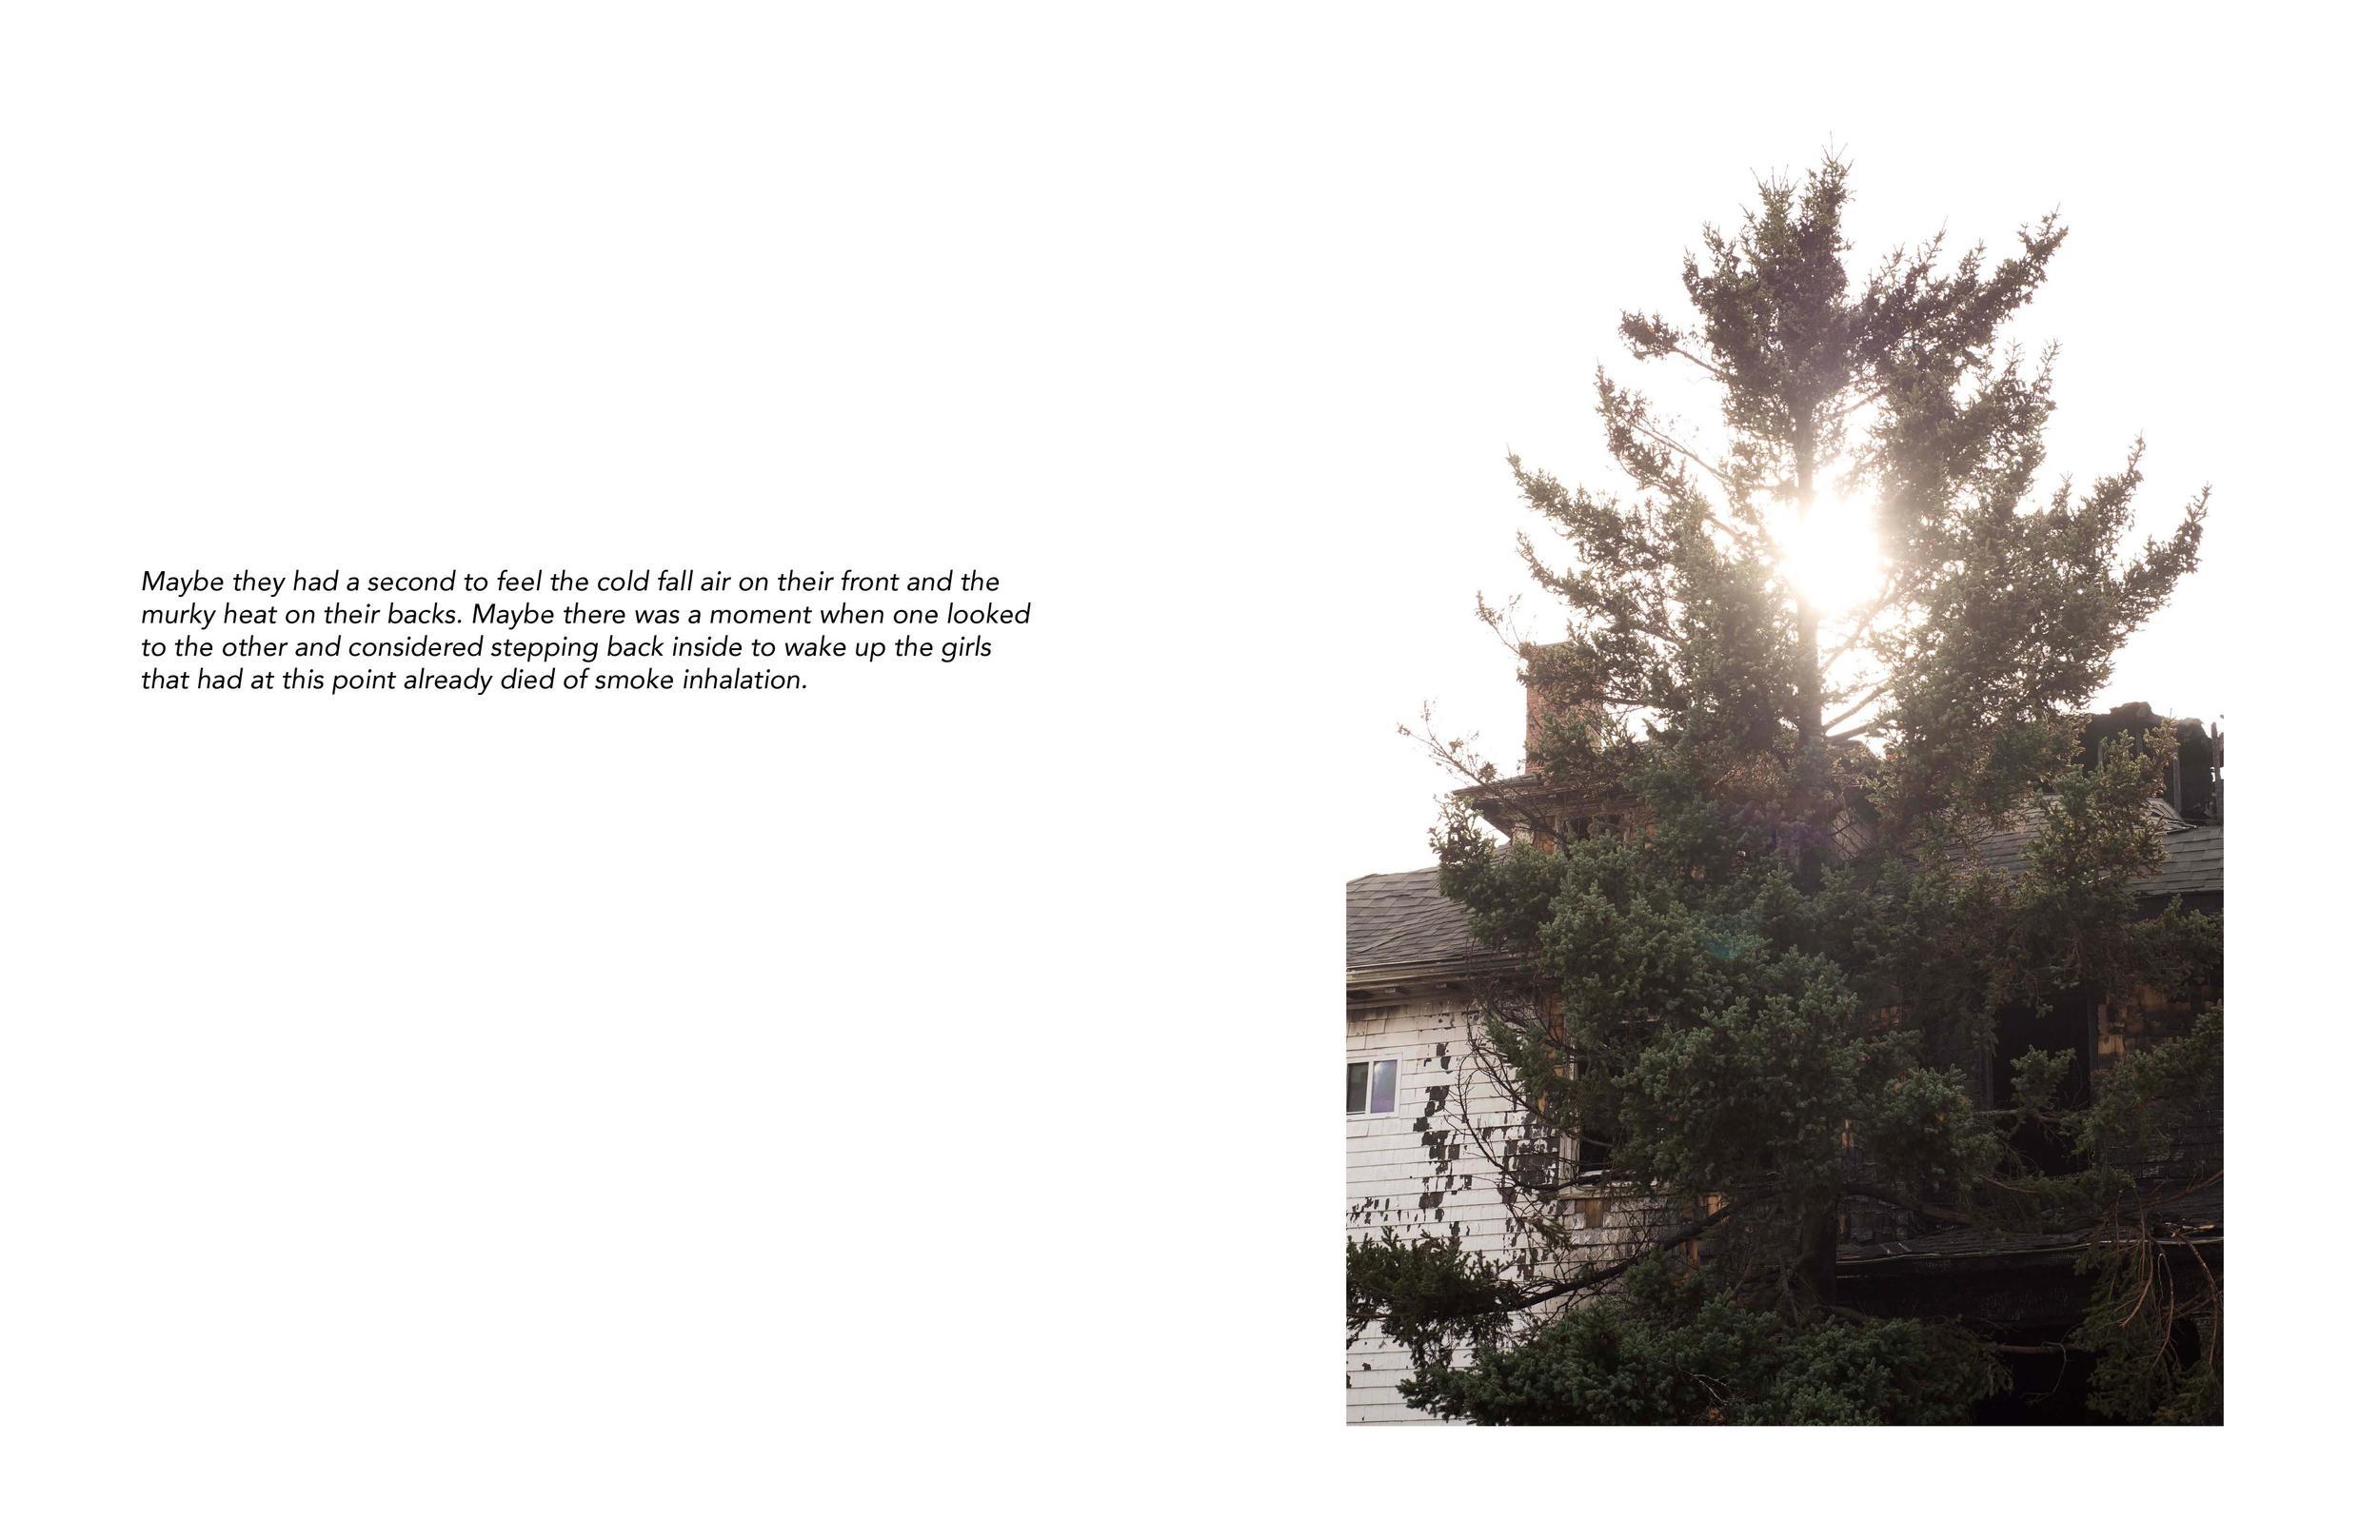 Vivian Ewing_Dry Grass Crackling-page-009.jpg